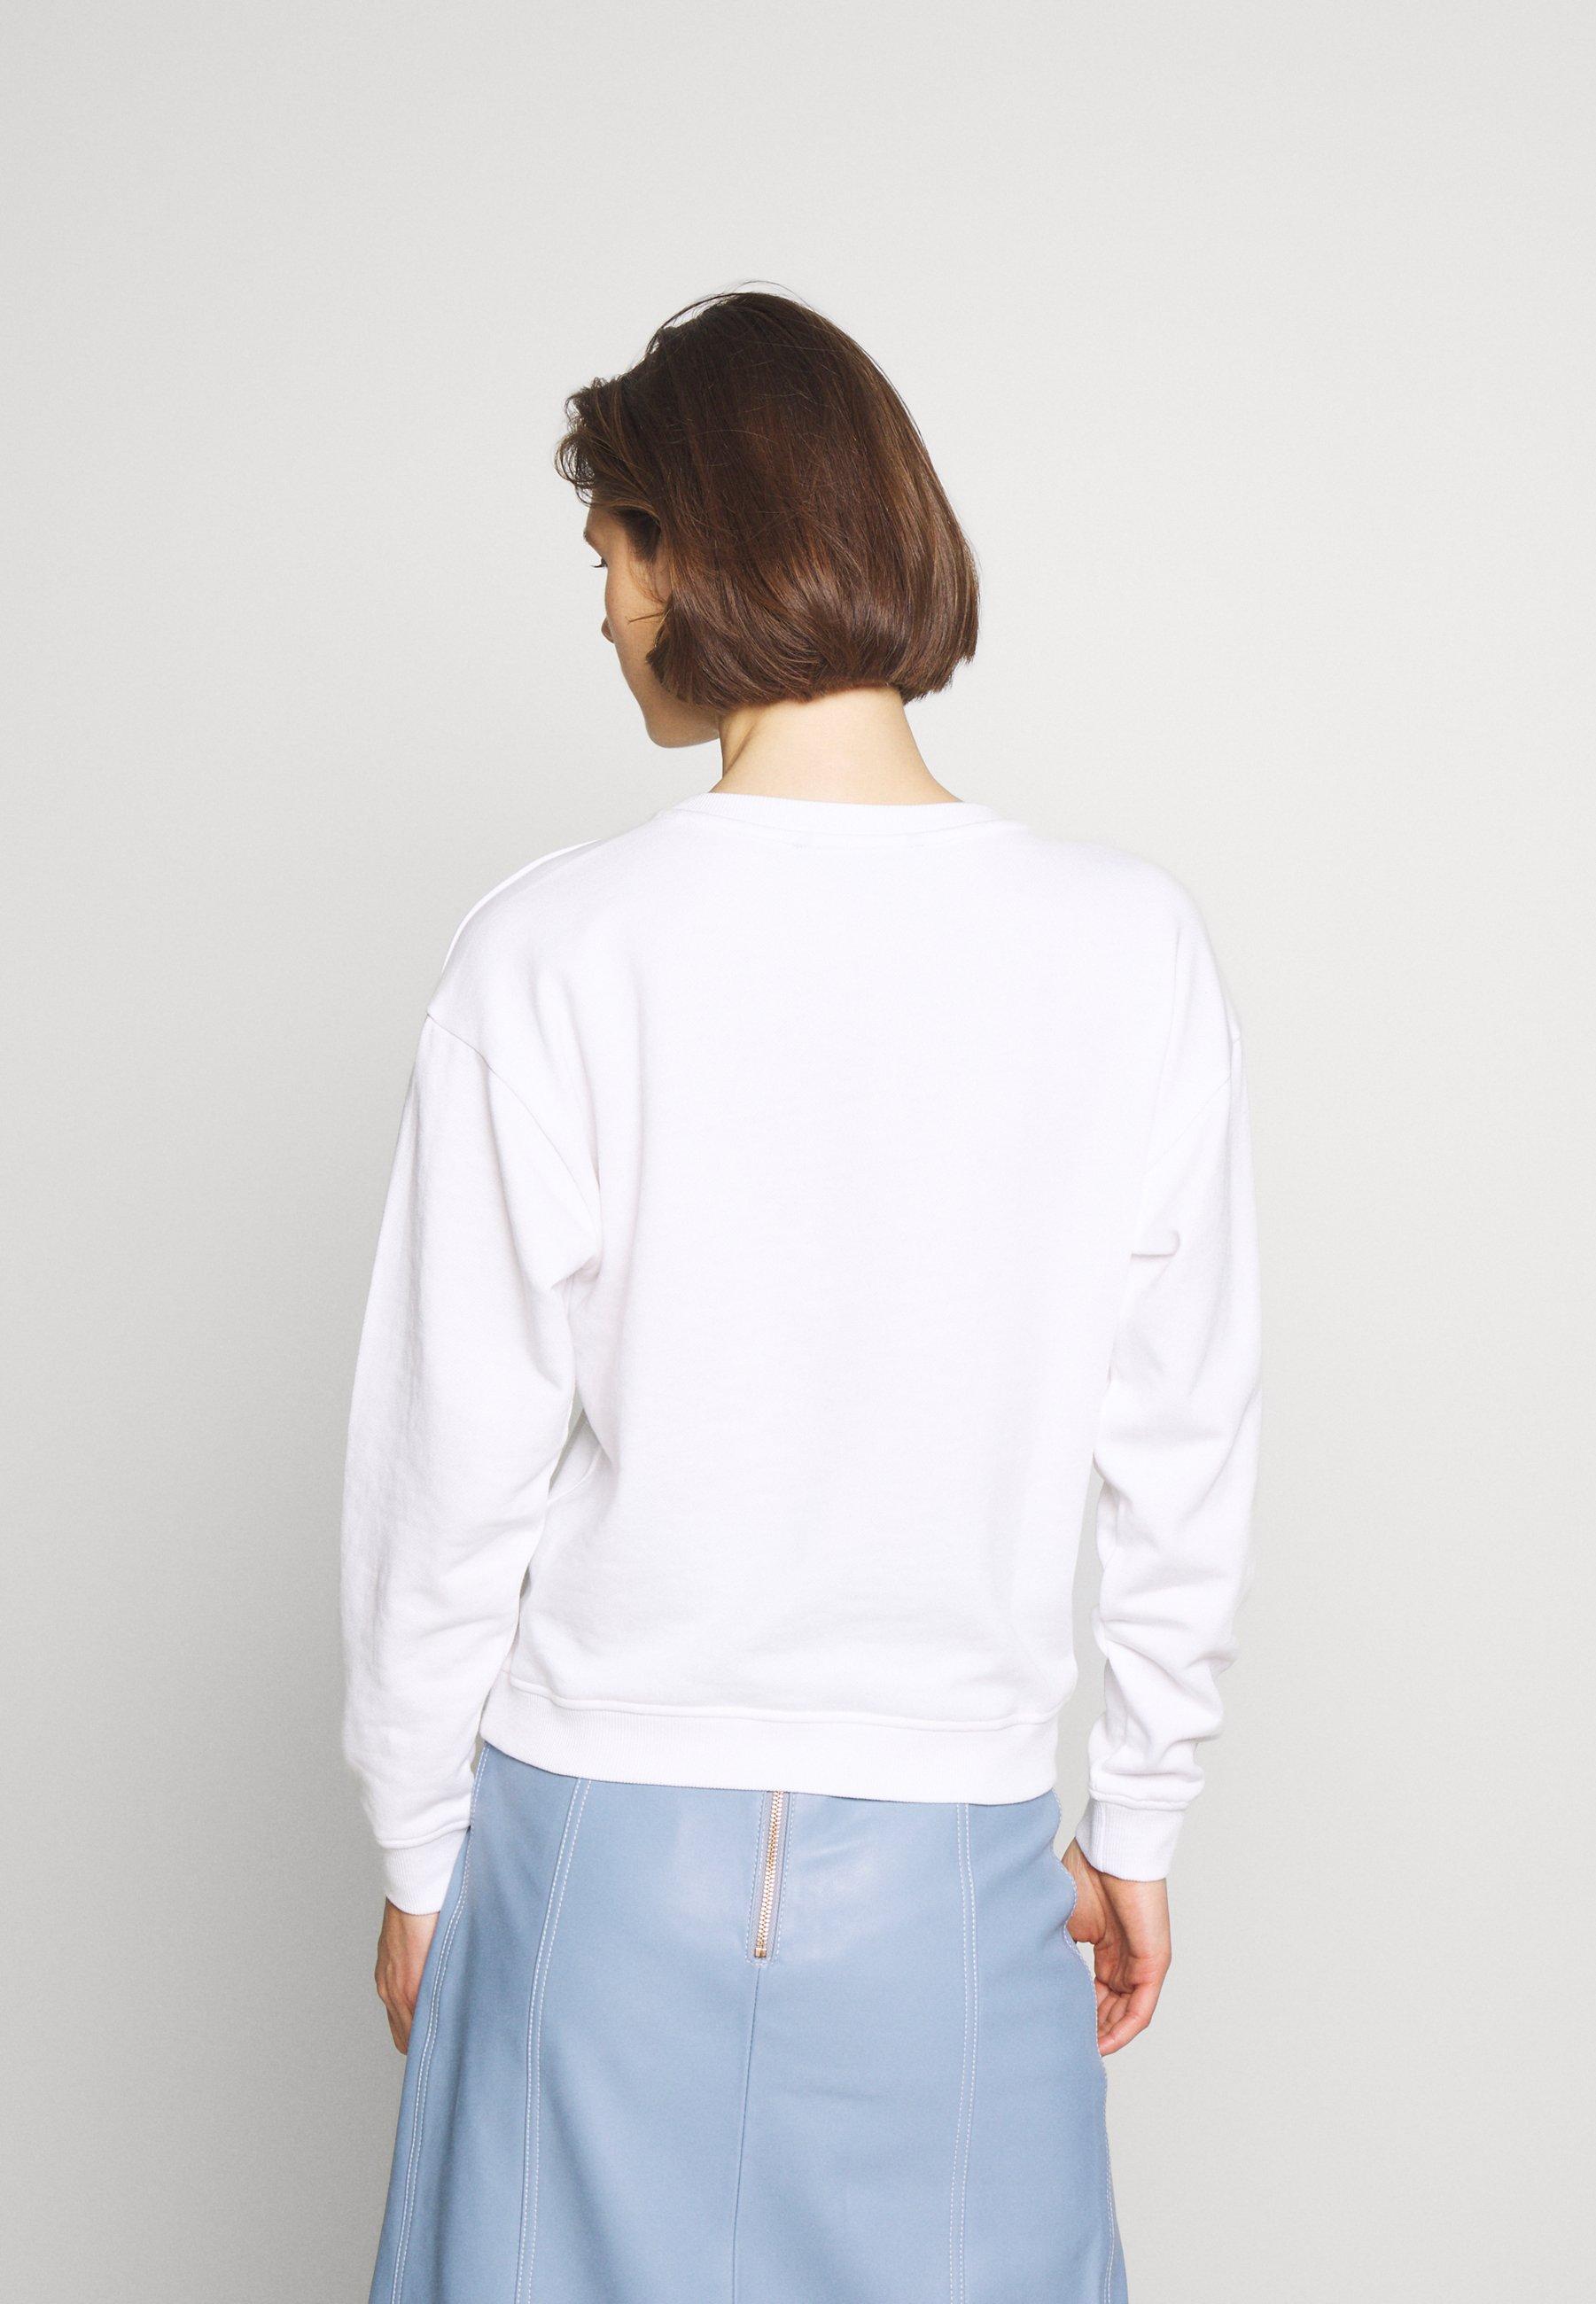 Armani Exchange Sweatshirt - white sognare